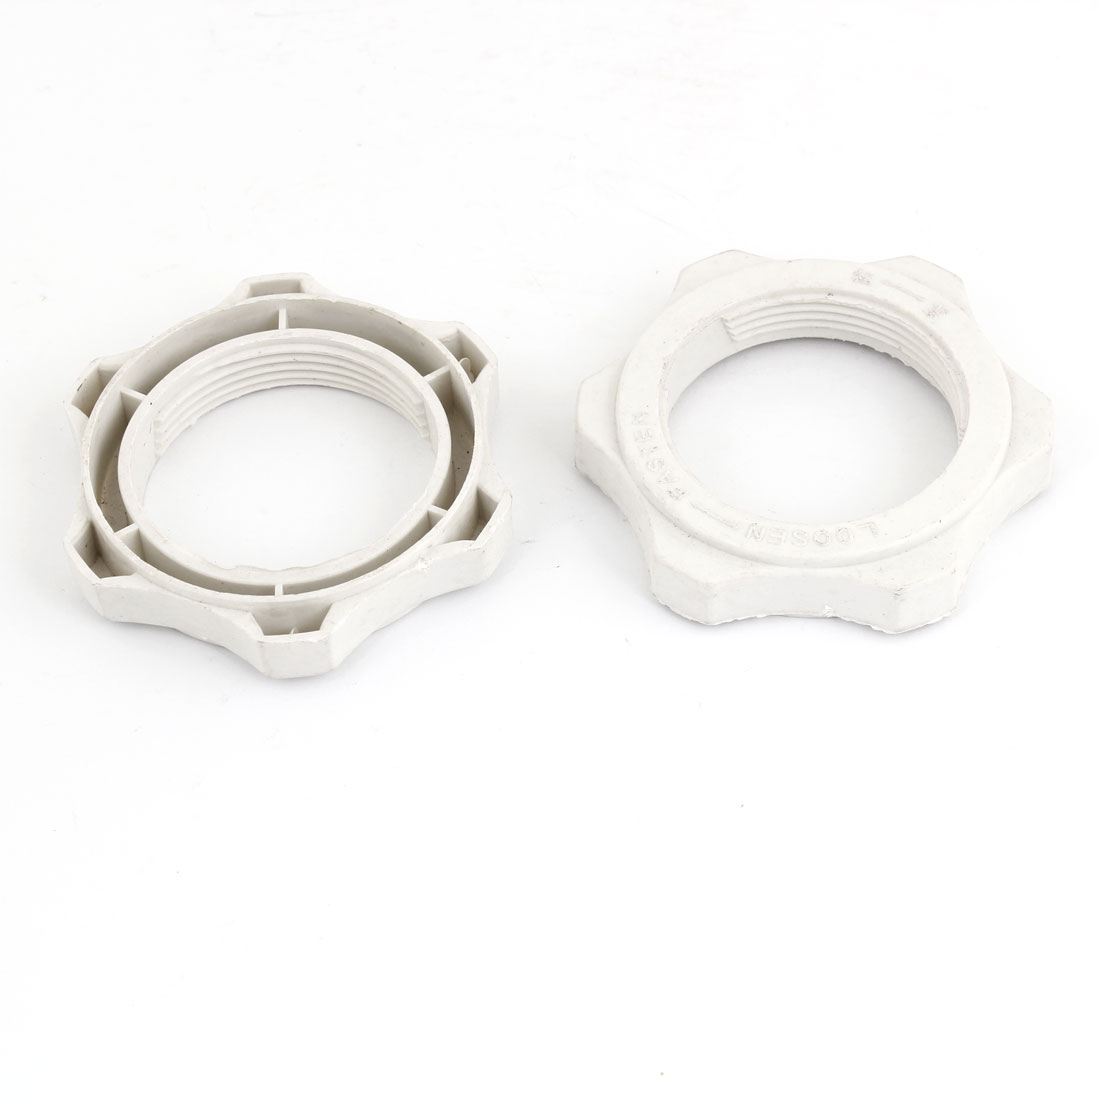 Off White Plastic 43mm Thread Fastening Screw Nut Fan Guard Fastener 2 Pcs